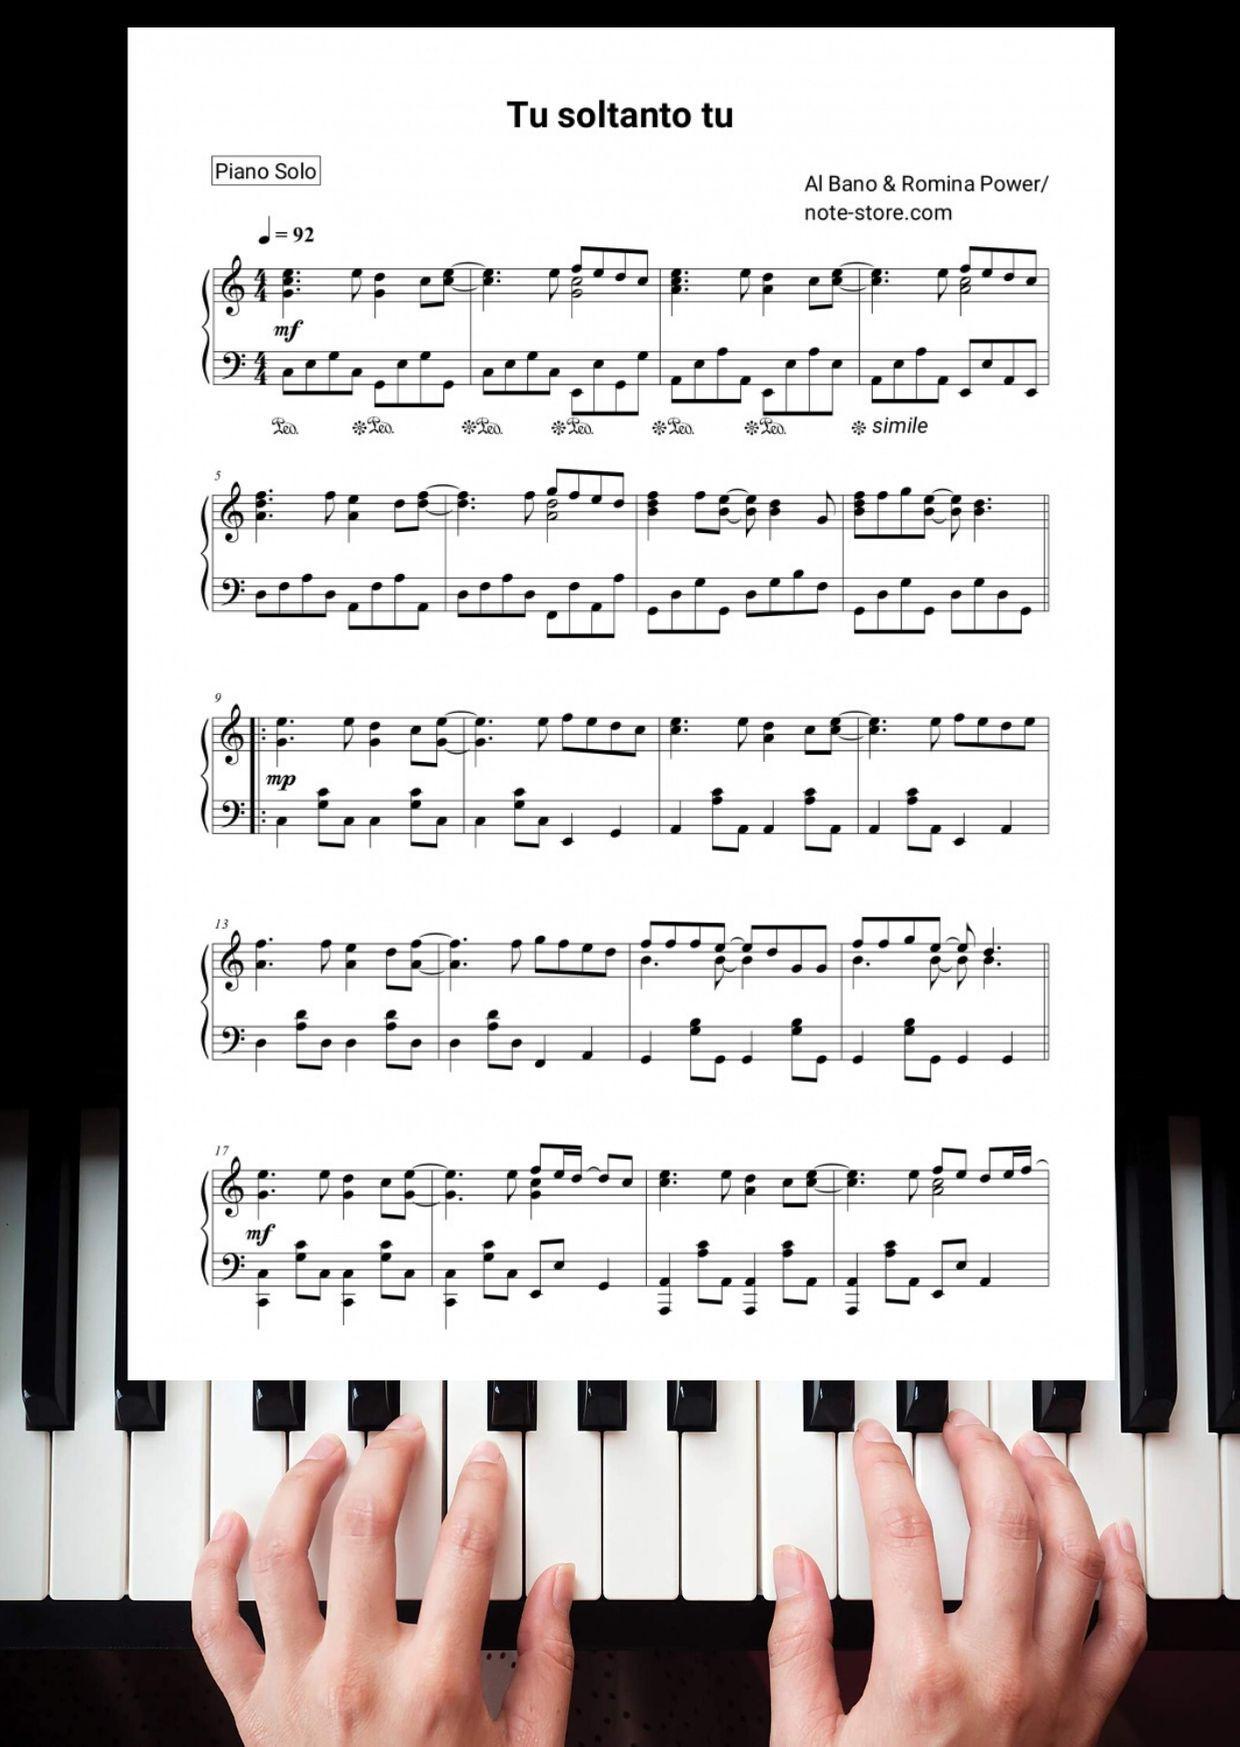 Sheet Music Al Bano Romina Power Tu Soltanto Tu For Piano Piano Solo Sheet Music Evanescence My Immortal